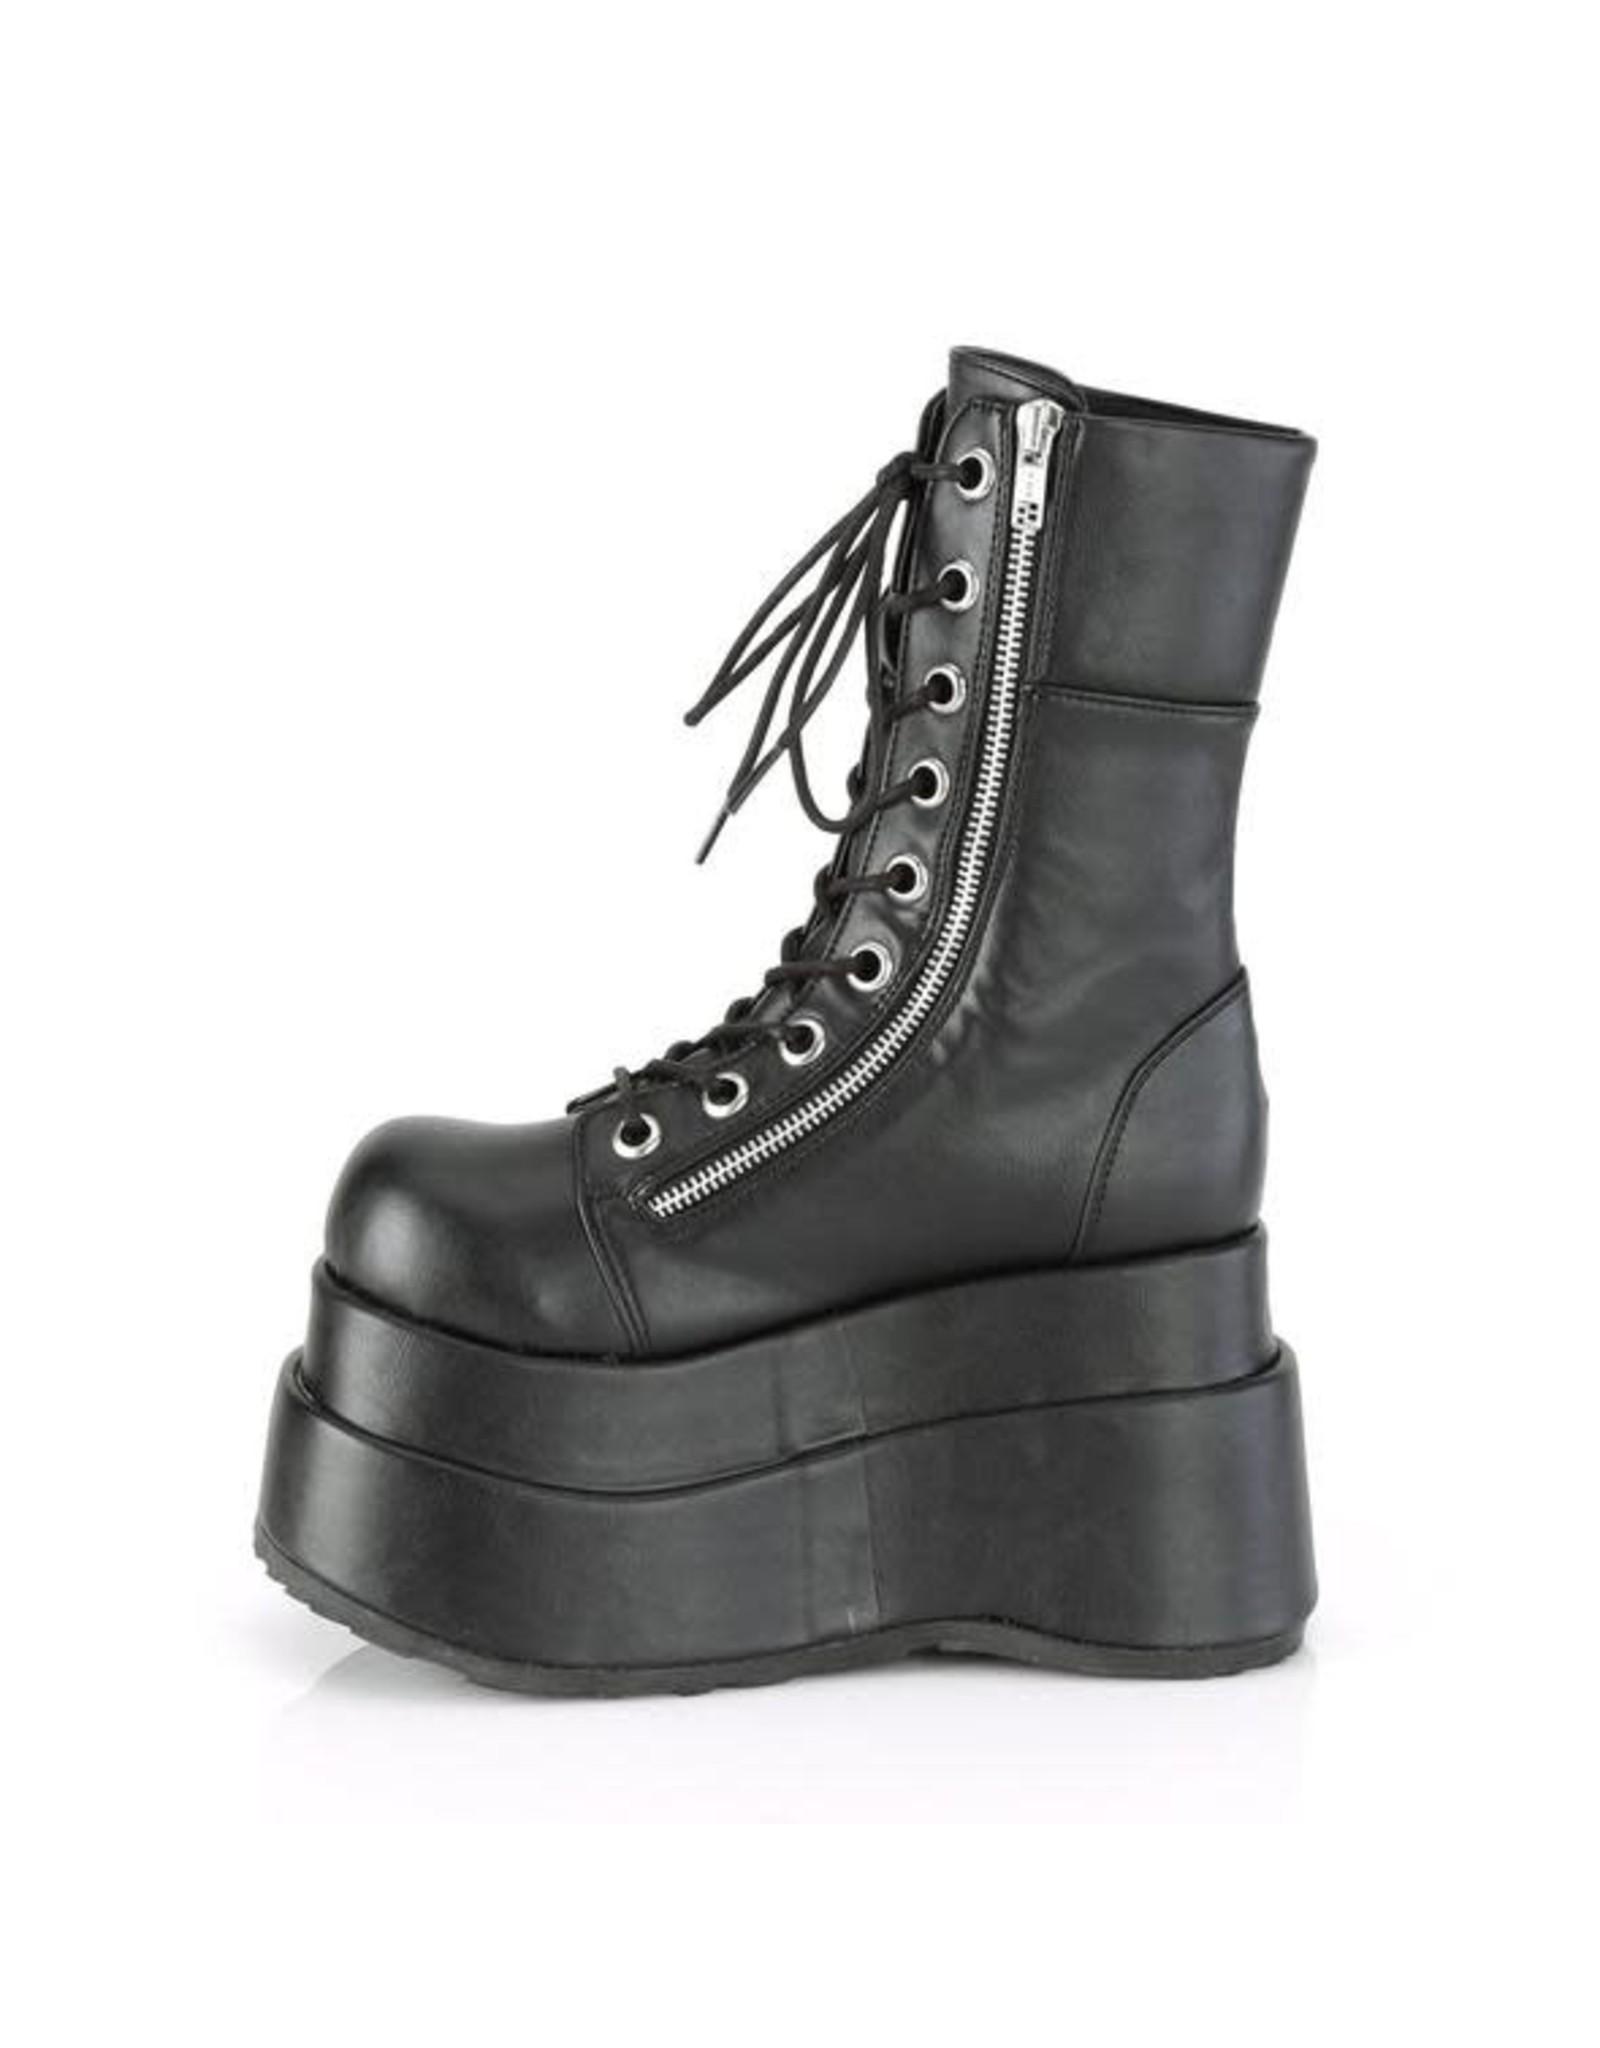 "DEMONIA BEAR-265 4 1/2"" Black Vegan Leather Tiered Platform Lace-UP Inner & Outer D58VB"